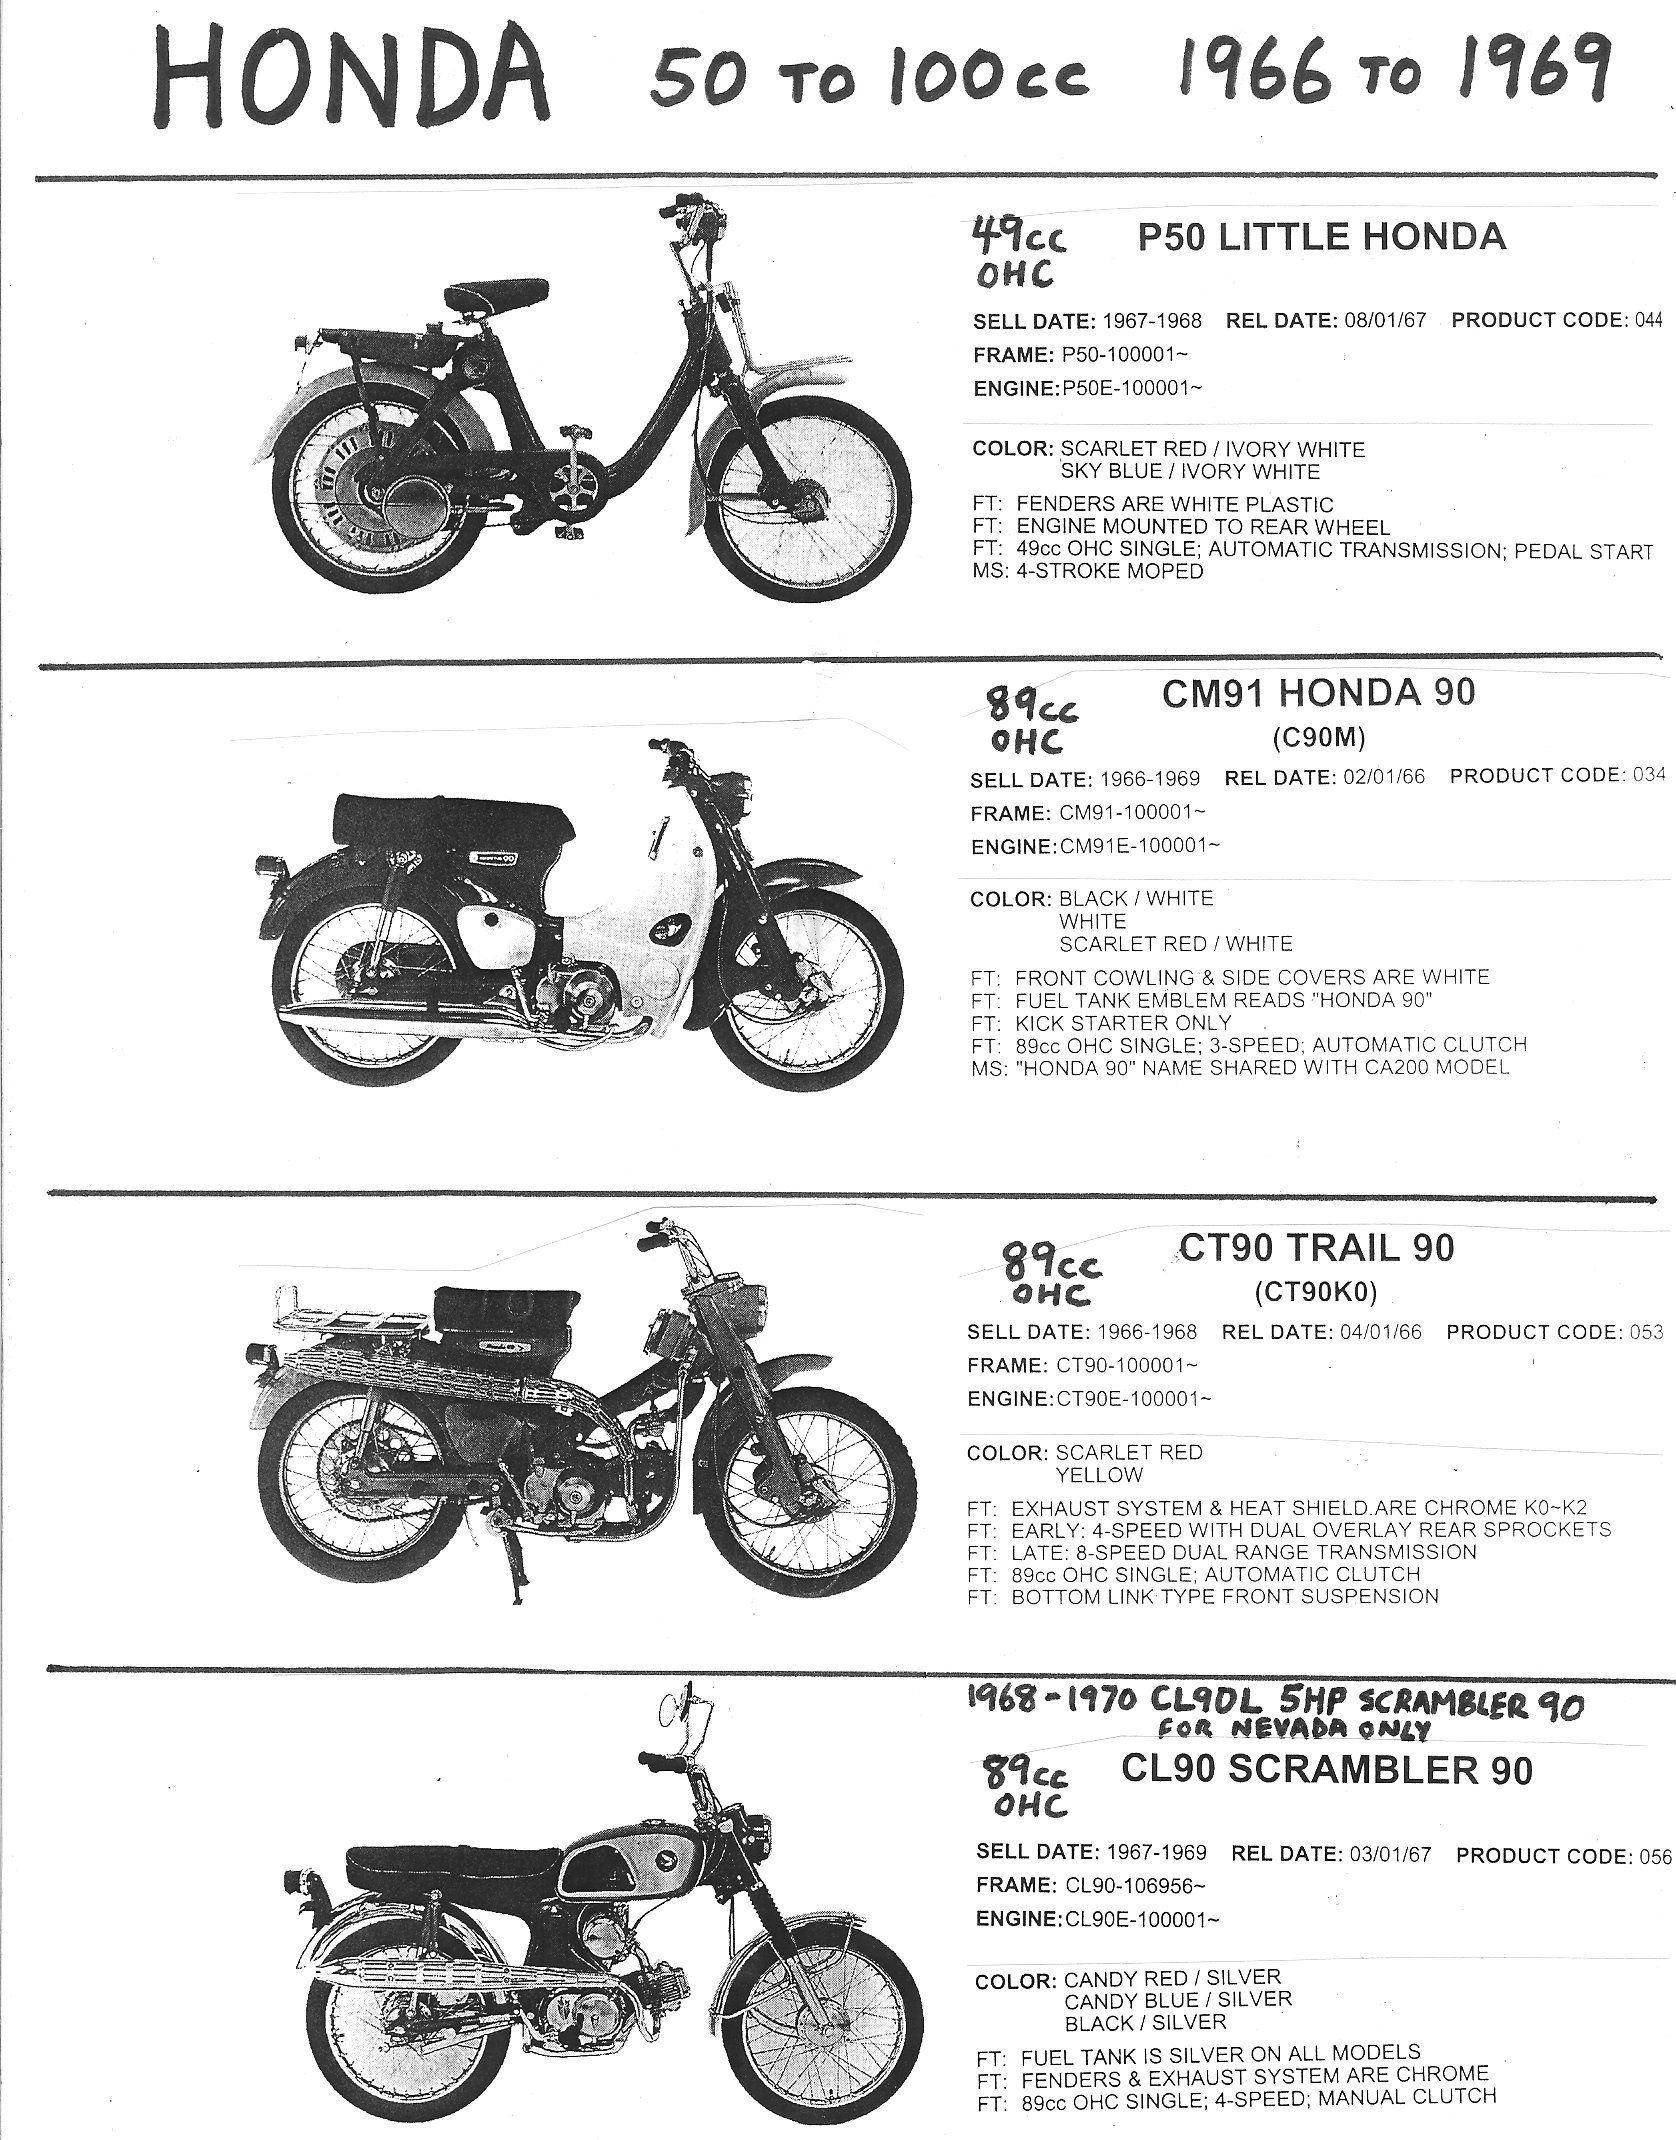 Info-Honda-1966-69-50-90cc.jpg (1676×2140) | Honda | Pinterest ...